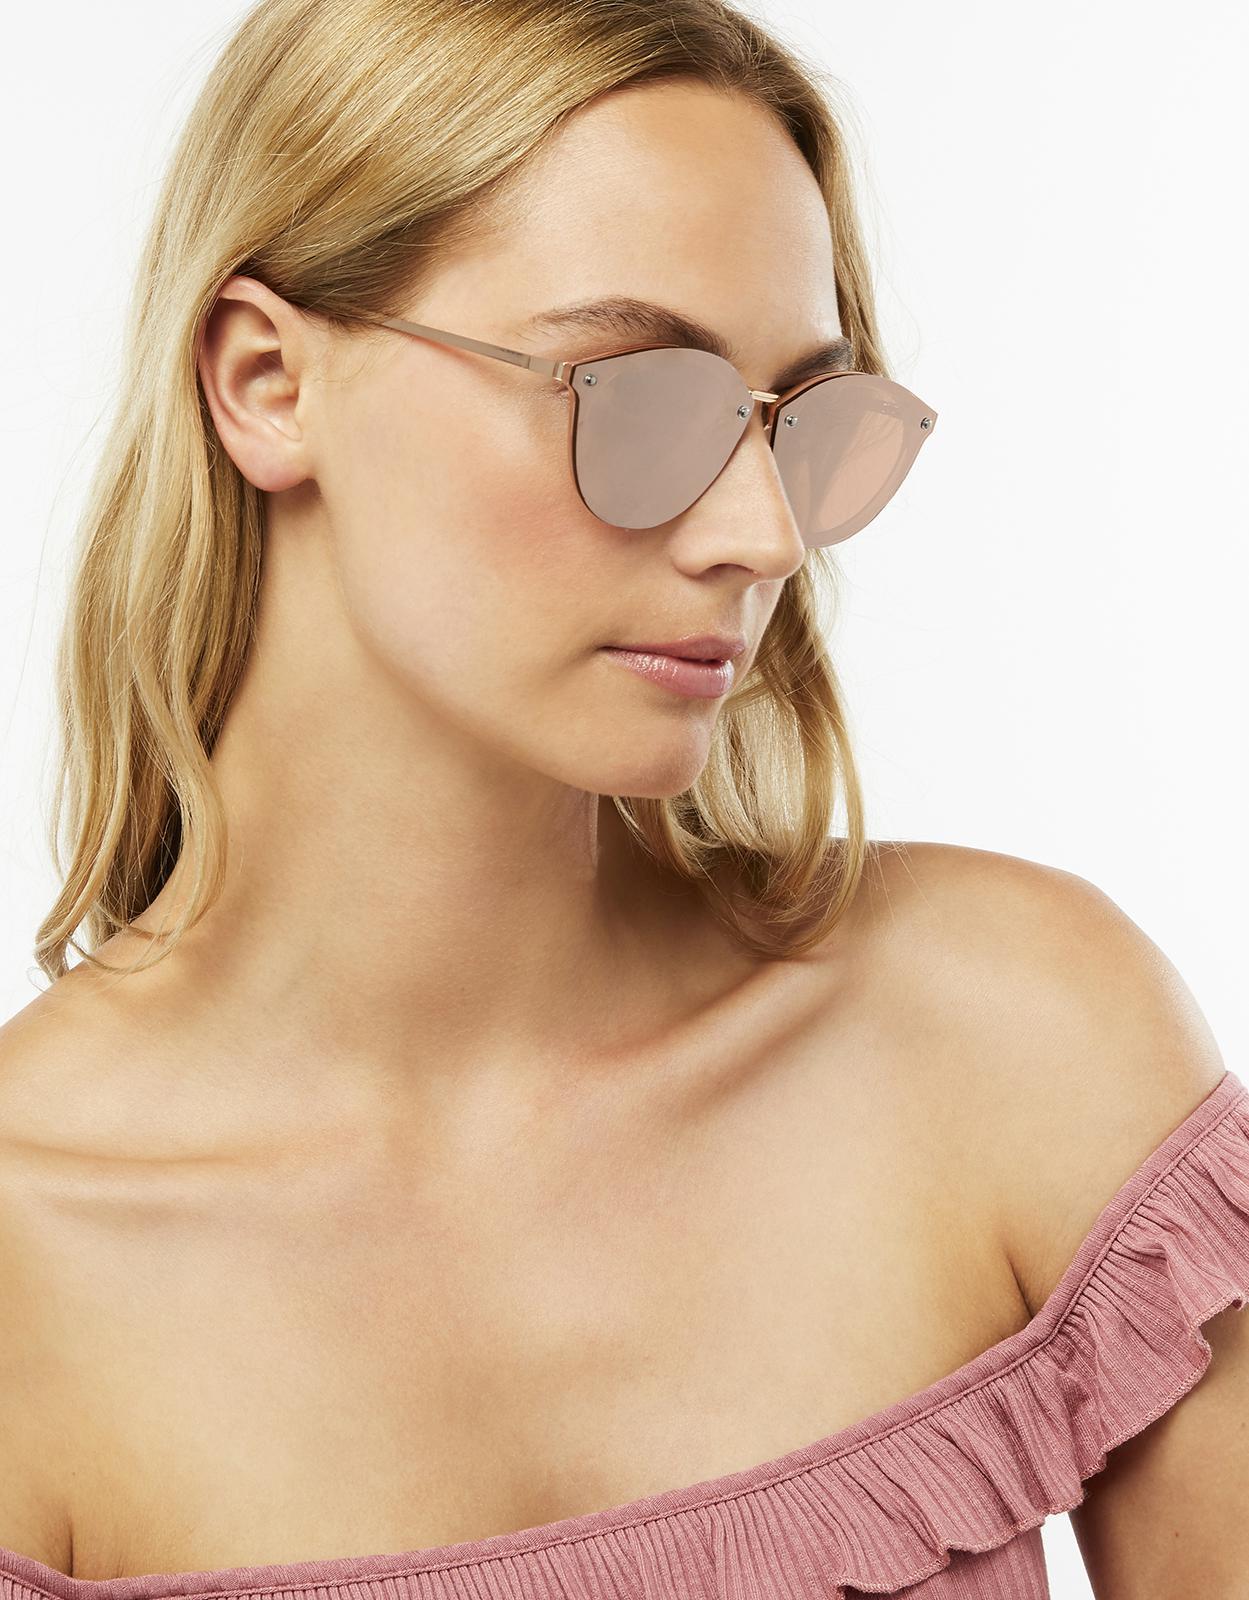 8100f33219e3aa Accessorize Rowan Rose Gold Layered Preppy Sunglasses in Metallic - Lyst